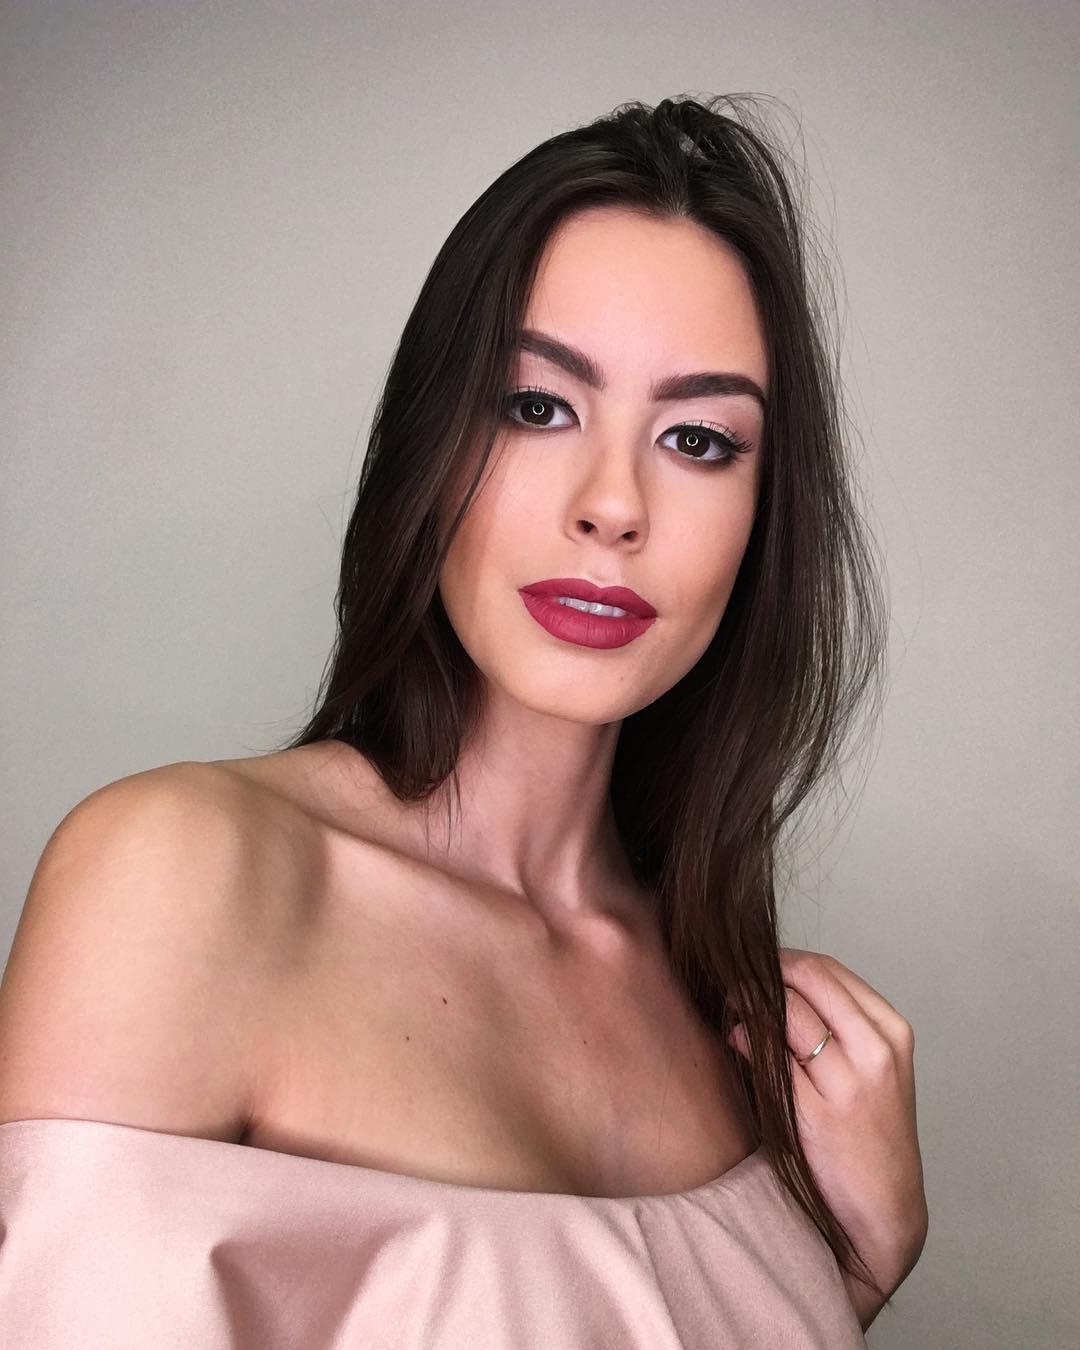 lorena rodrigues, miss grand minas gerais 2019/2nd runner-up de miss global beauty queen 2017. - Página 3 Nj9ygk9k